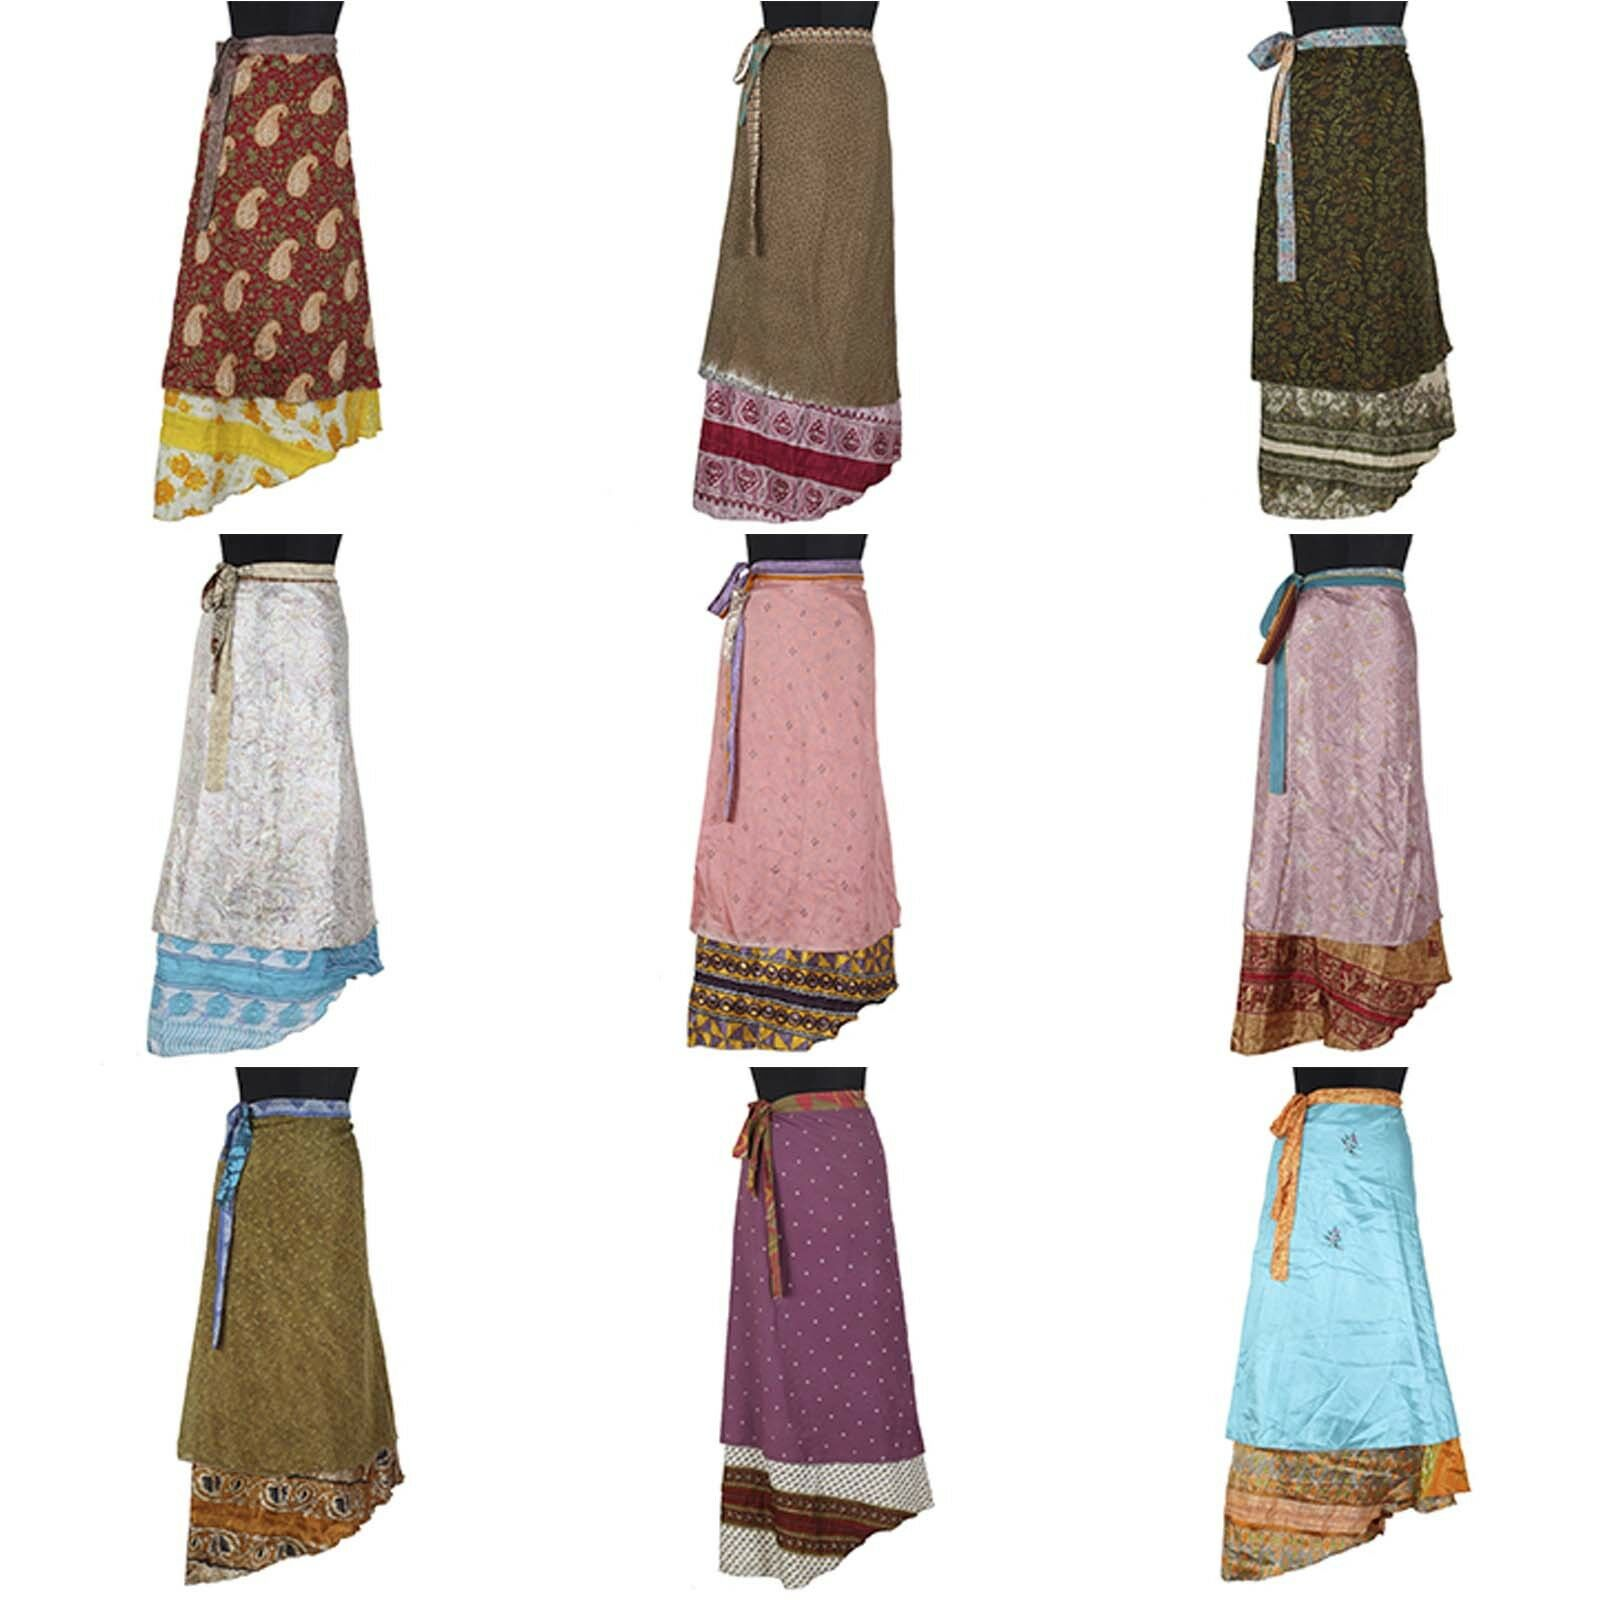 5 Pcs Mix Skirt Lot Vintage Art Silk Reversible Magic Silk Skirt